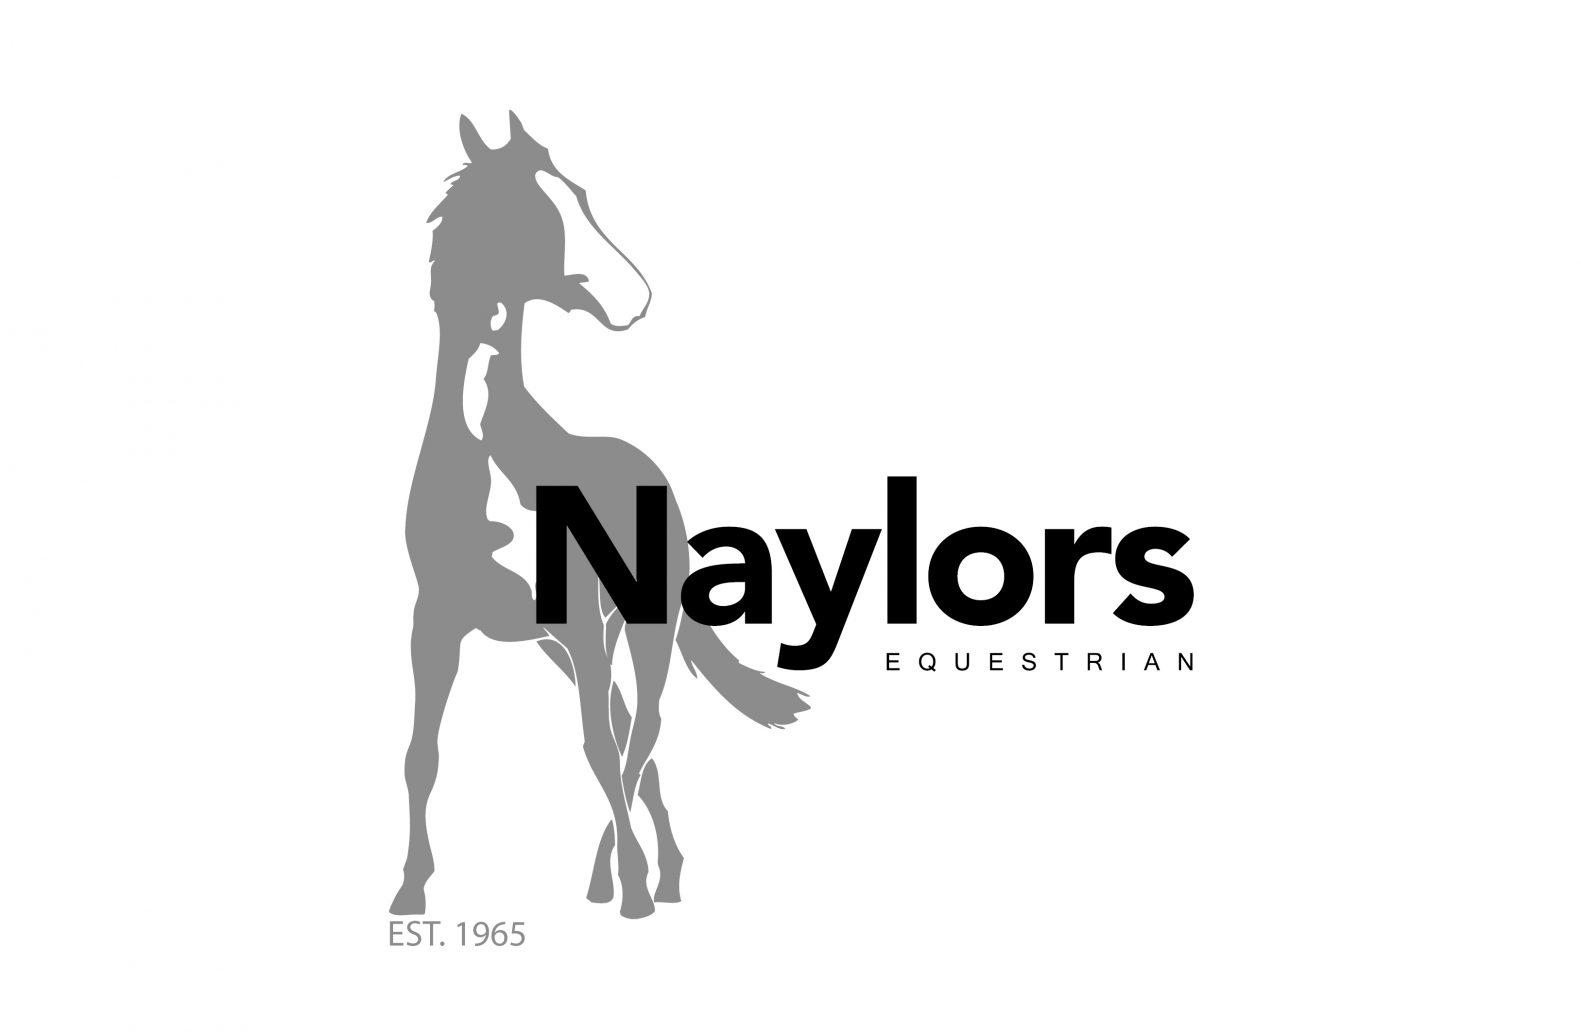 Naylors Equestrian Branding